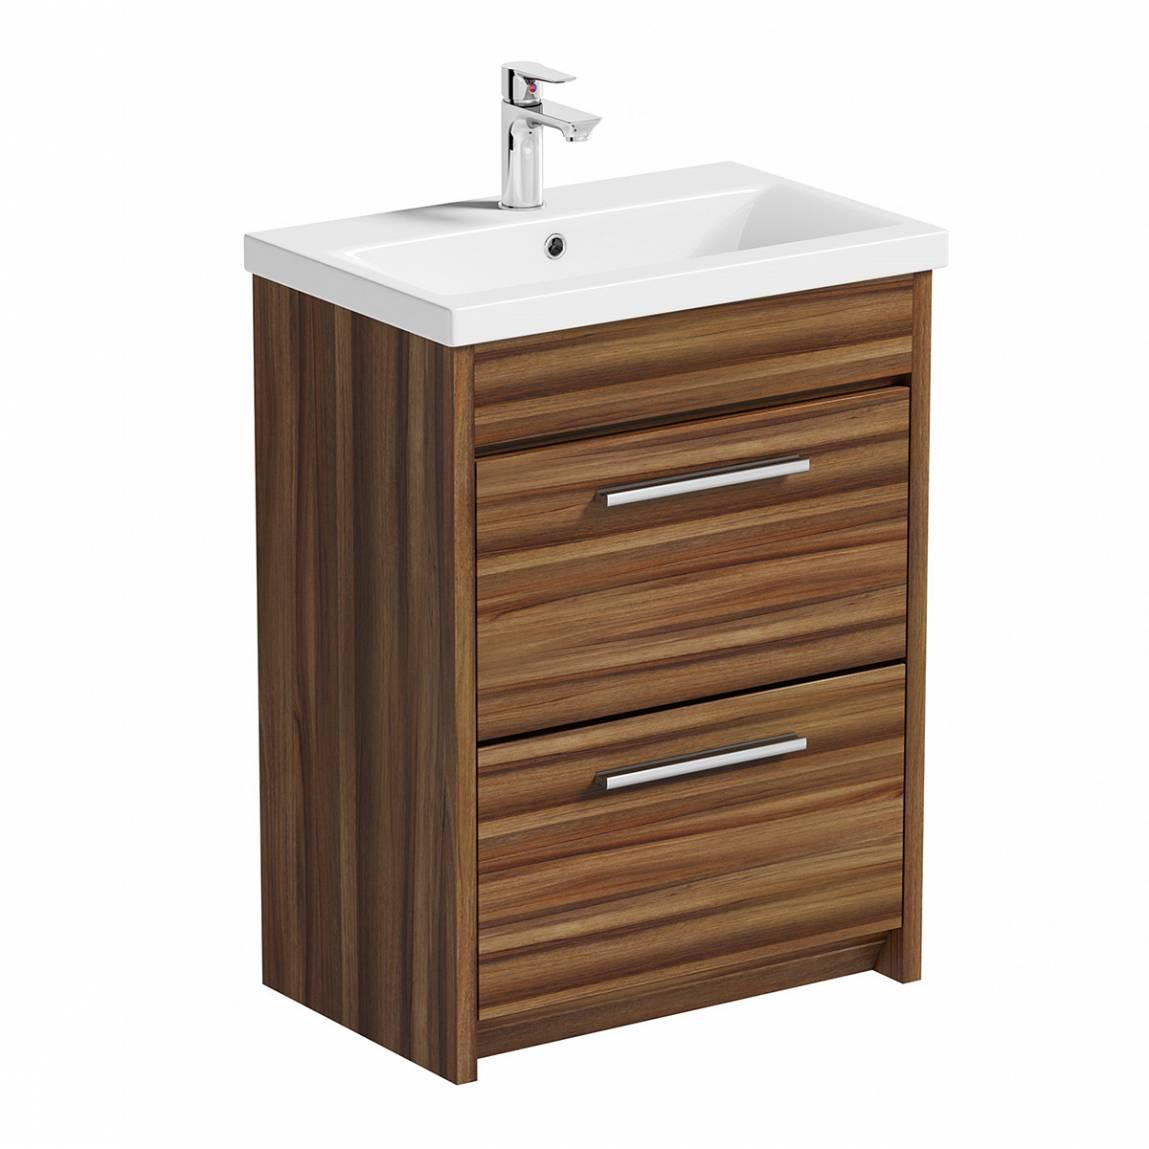 Image of Smart Walnut Floor Mounted 600 Drawer Unit & Basin